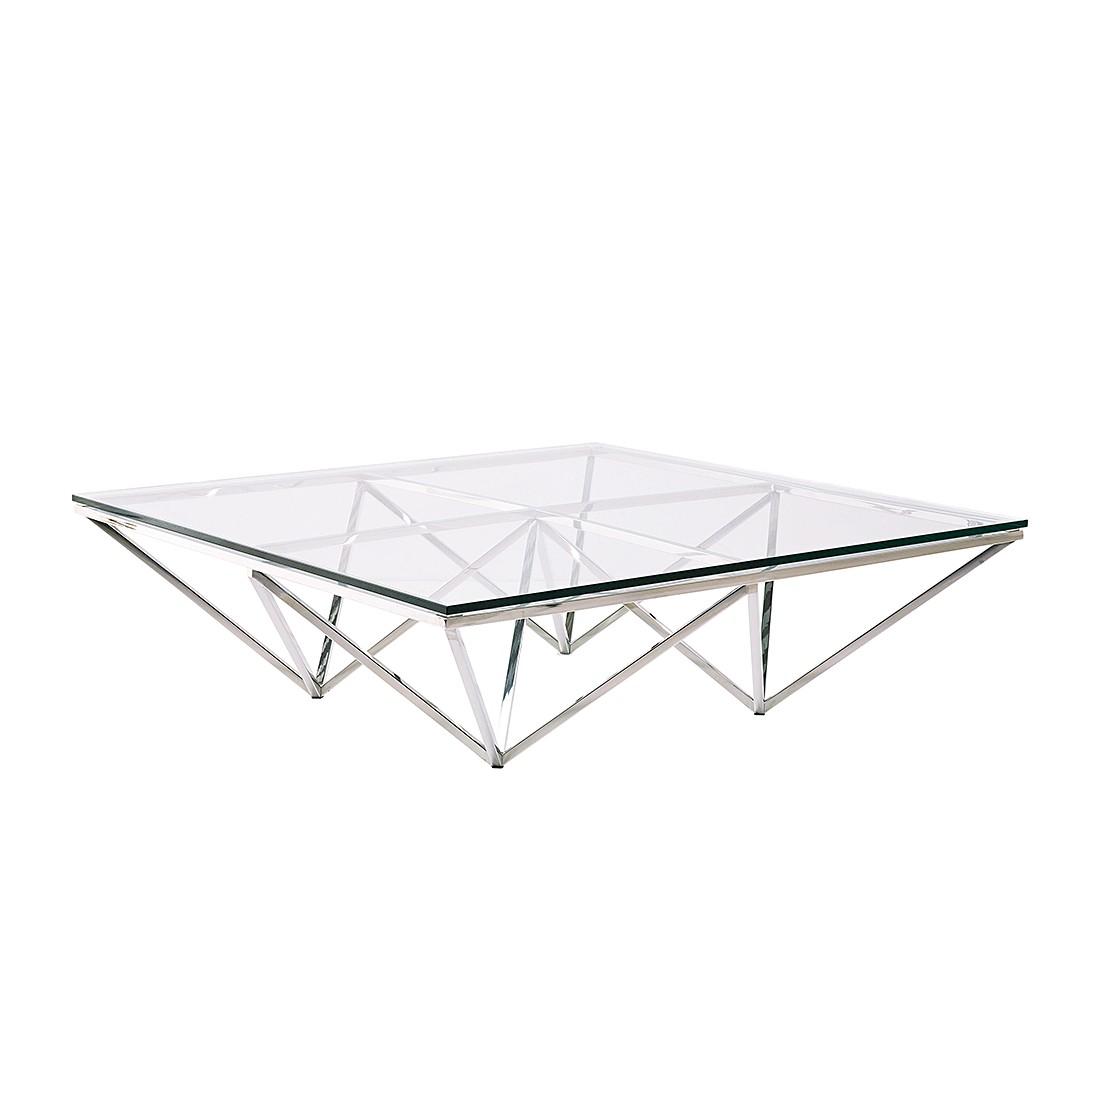 Table basse Network, Kare Design